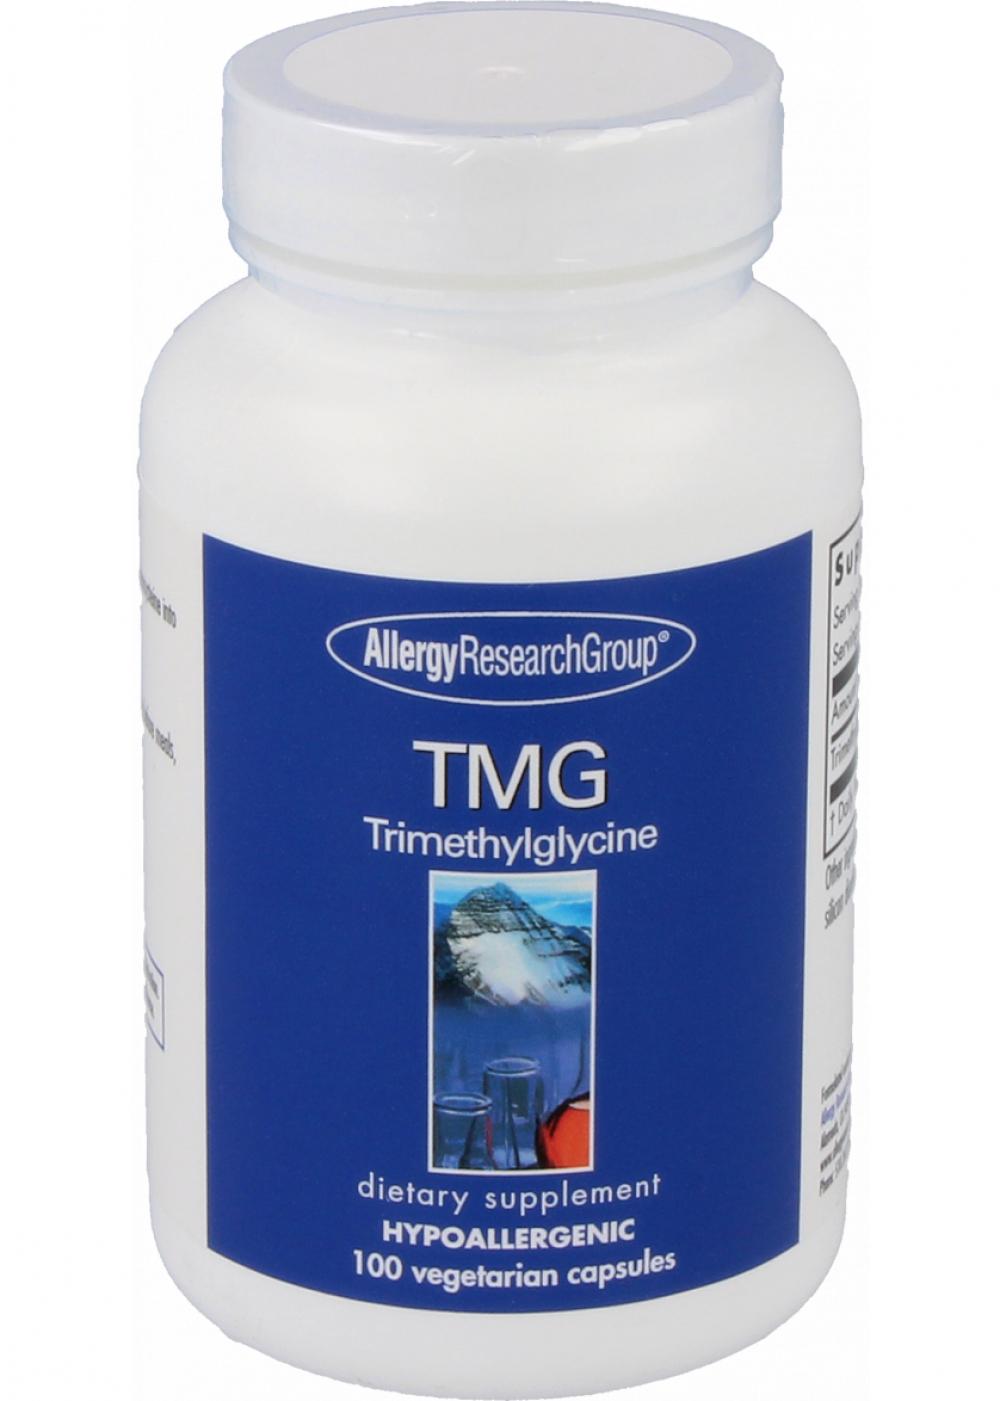 Allergy Research Group TMG Trimethylglycine (Betain) 100 veg. Kapseln